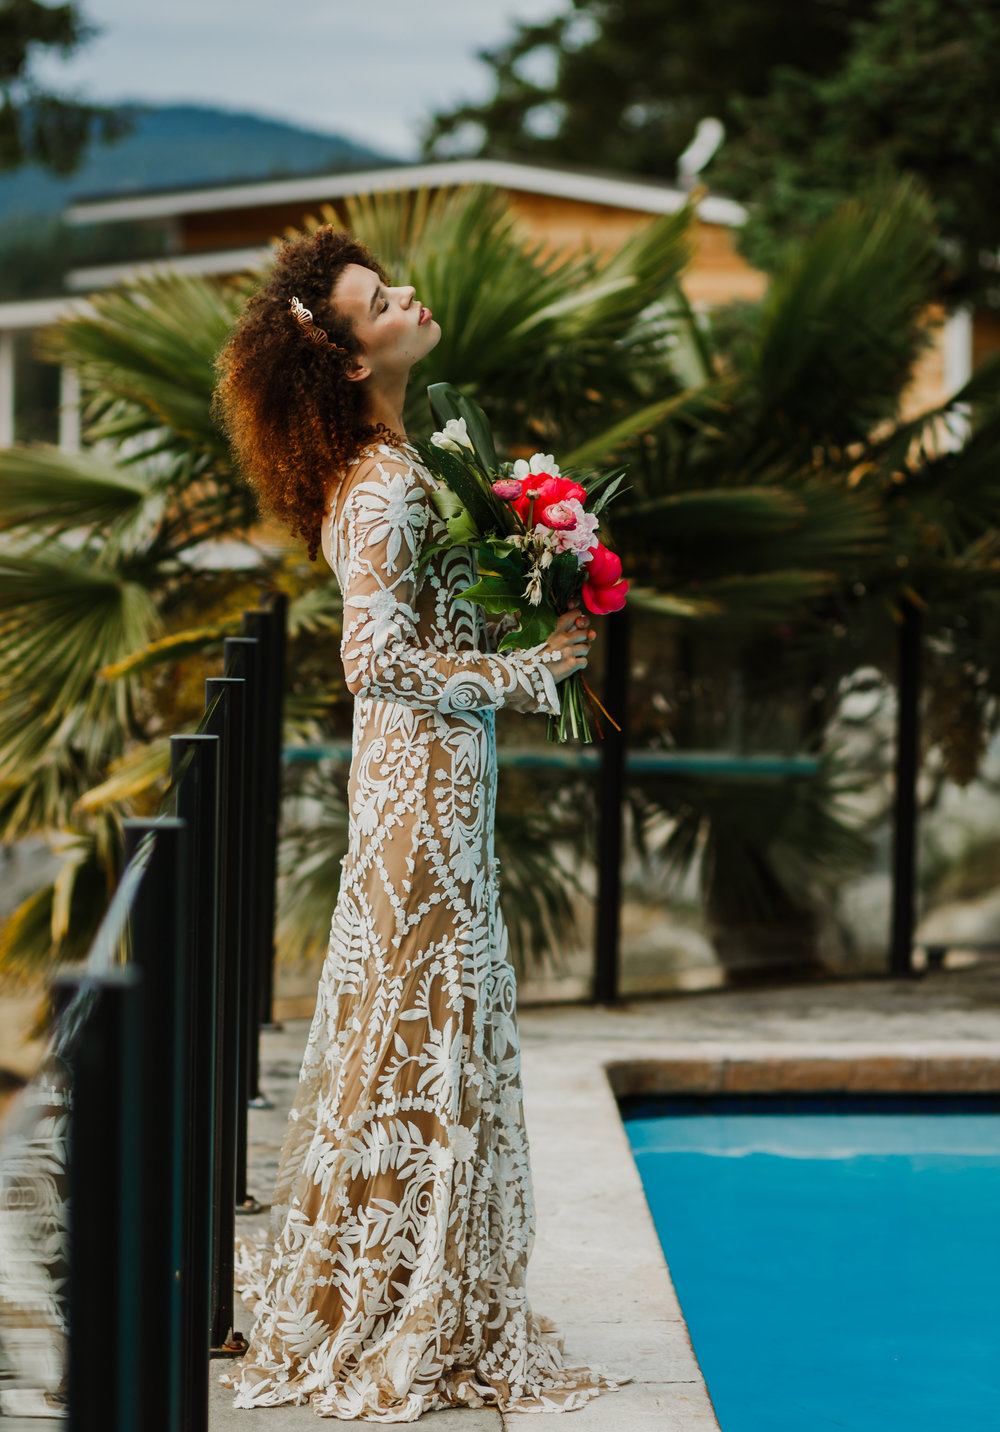 West Coast Bride - Vancouver Wedding Photographer & Videographer - Sunshine Coast Wedding Photos - Sunshine Coast Wedding Photographer - Jennifer Picard Photography - IMG_6335.jpg